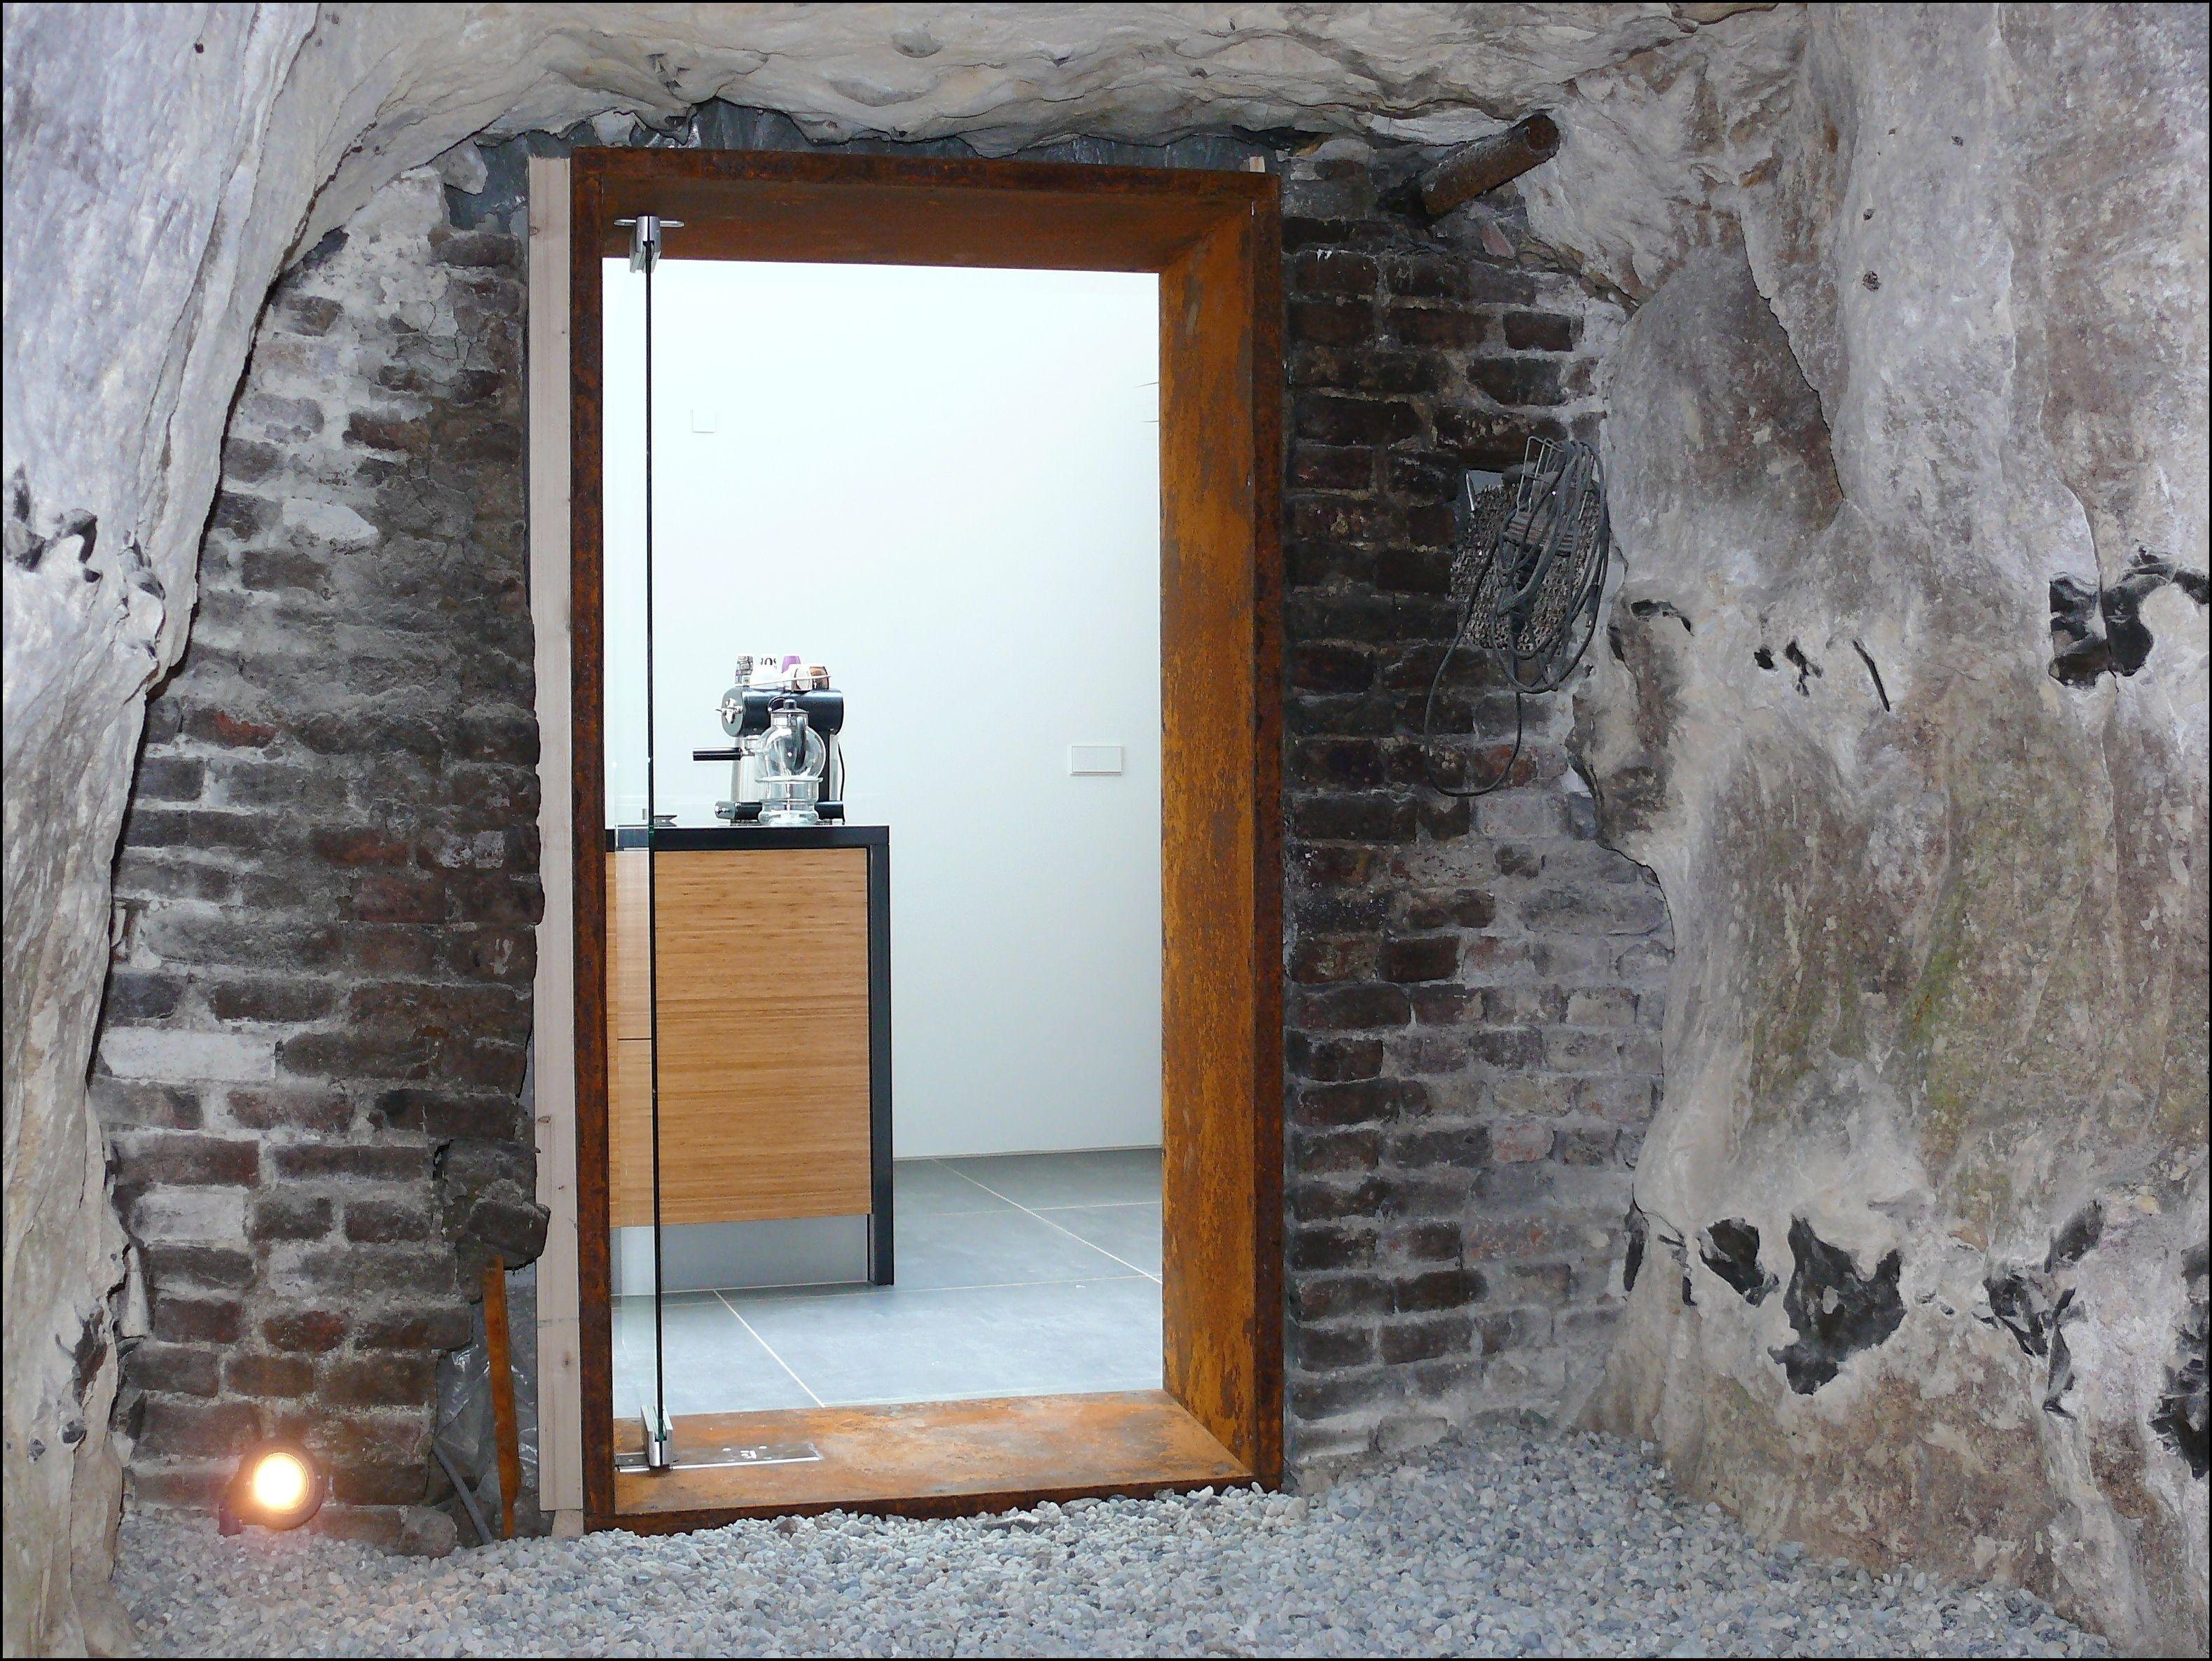 House: Brick Wall, Corten Steel Frame, Glass Door. Woning: Gemetselde Muur